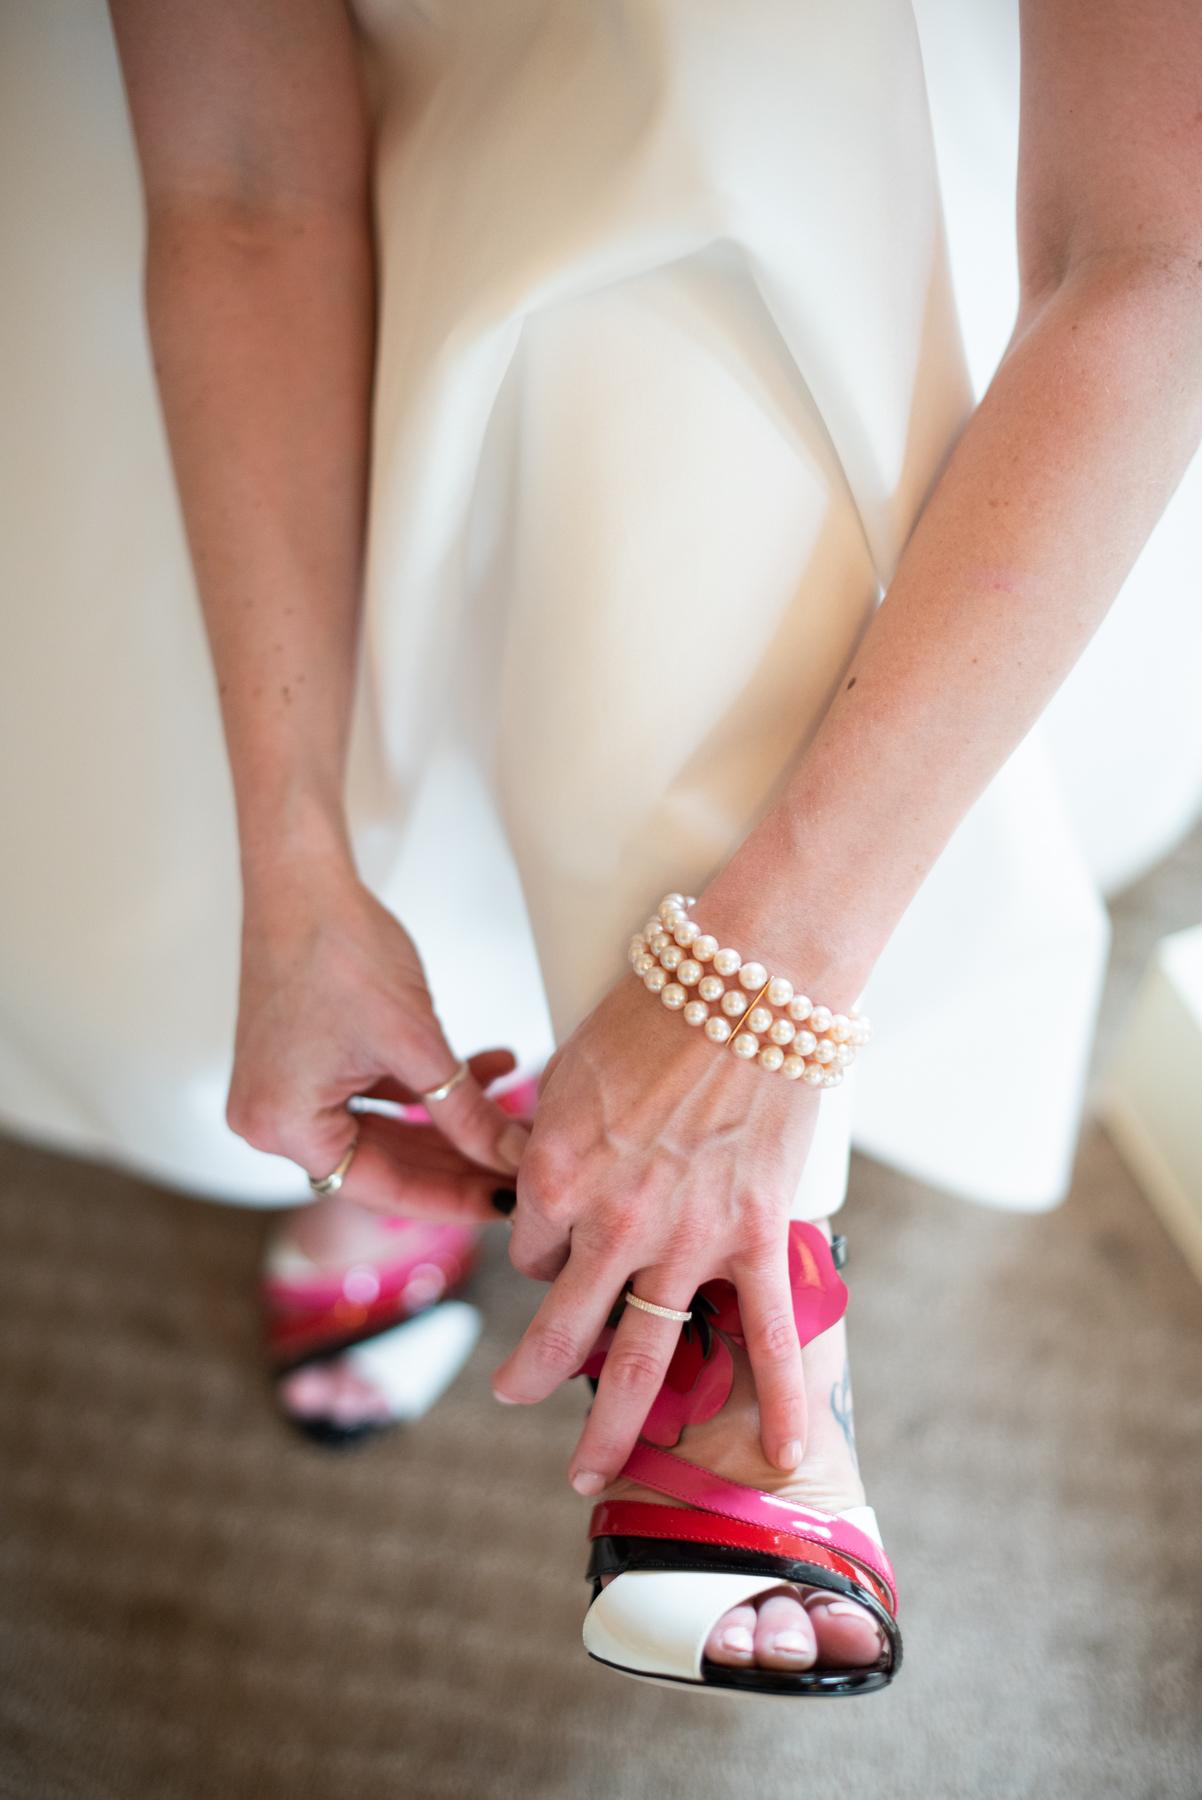 Secret Garden Event Center Wedding - Meredith Amadee Photography-3-4.jpg